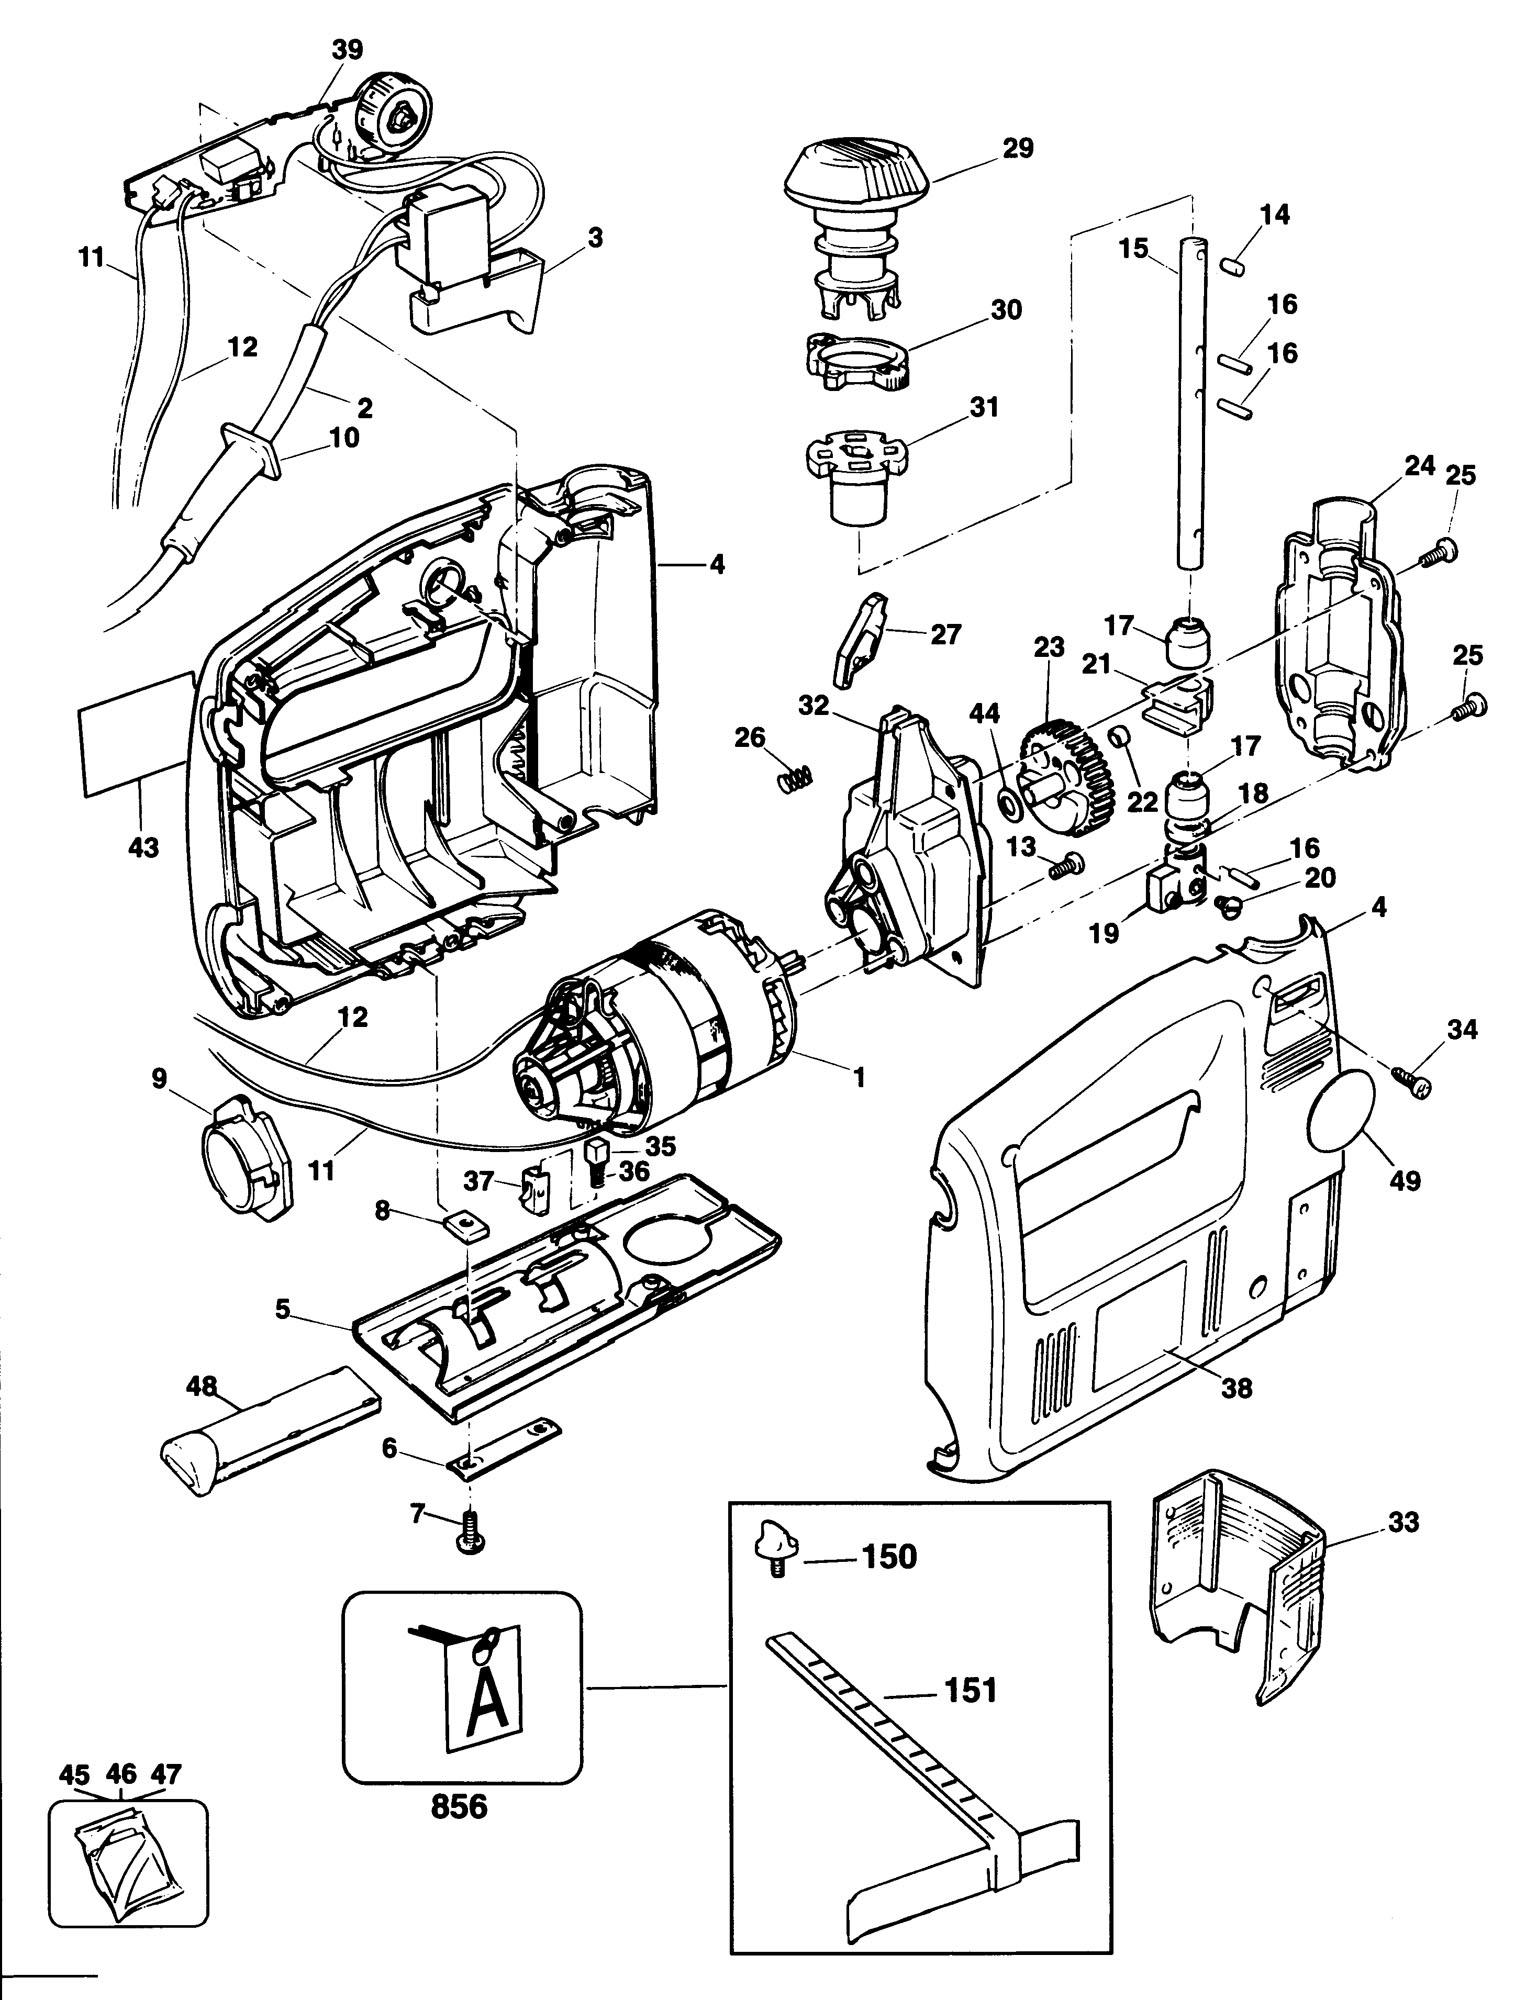 Spares For Black  U0026 Decker Dn538se Scroller Jigsaw  Type 1